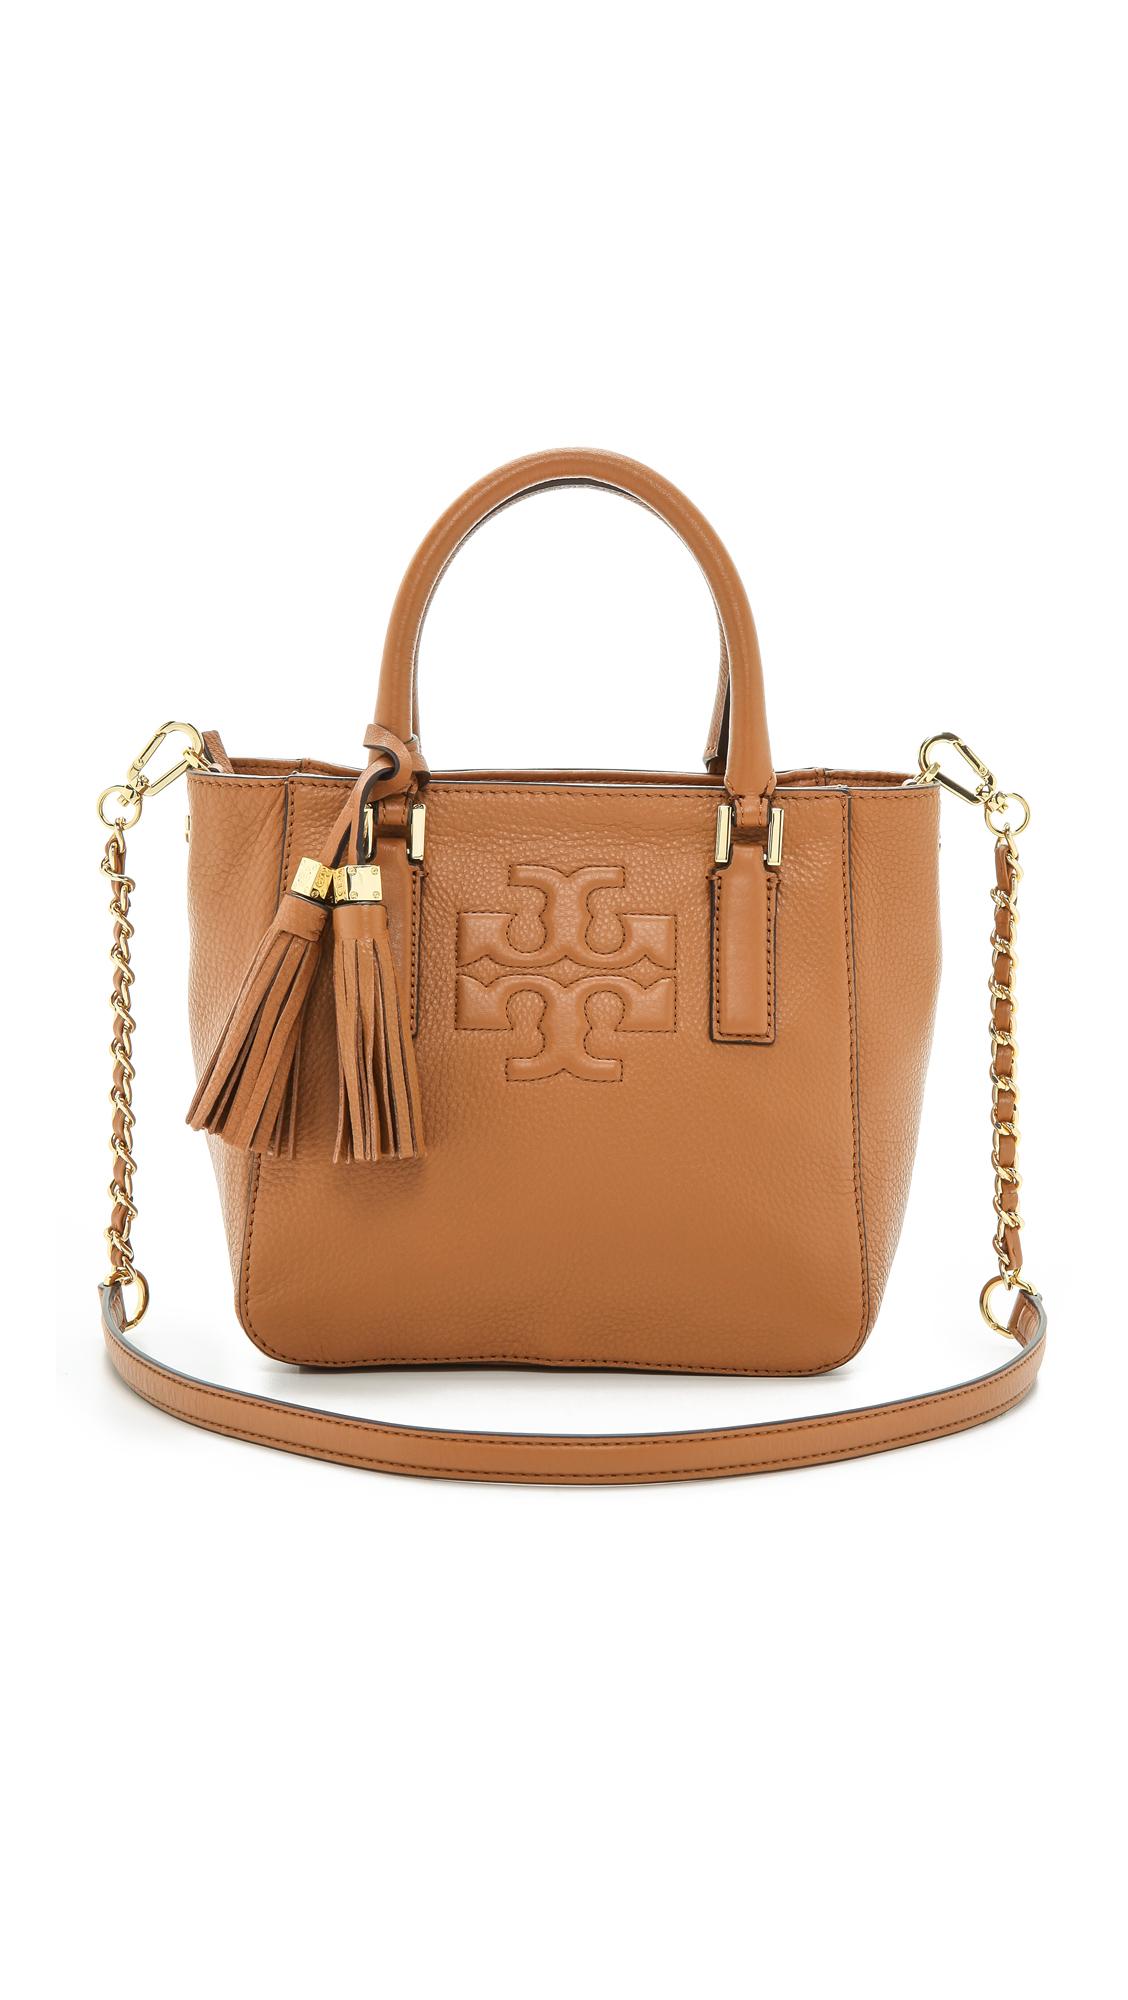 674069ff356f Lyst - Tory Burch Thea Mini Bucket Bag - Kir Royale in Brown